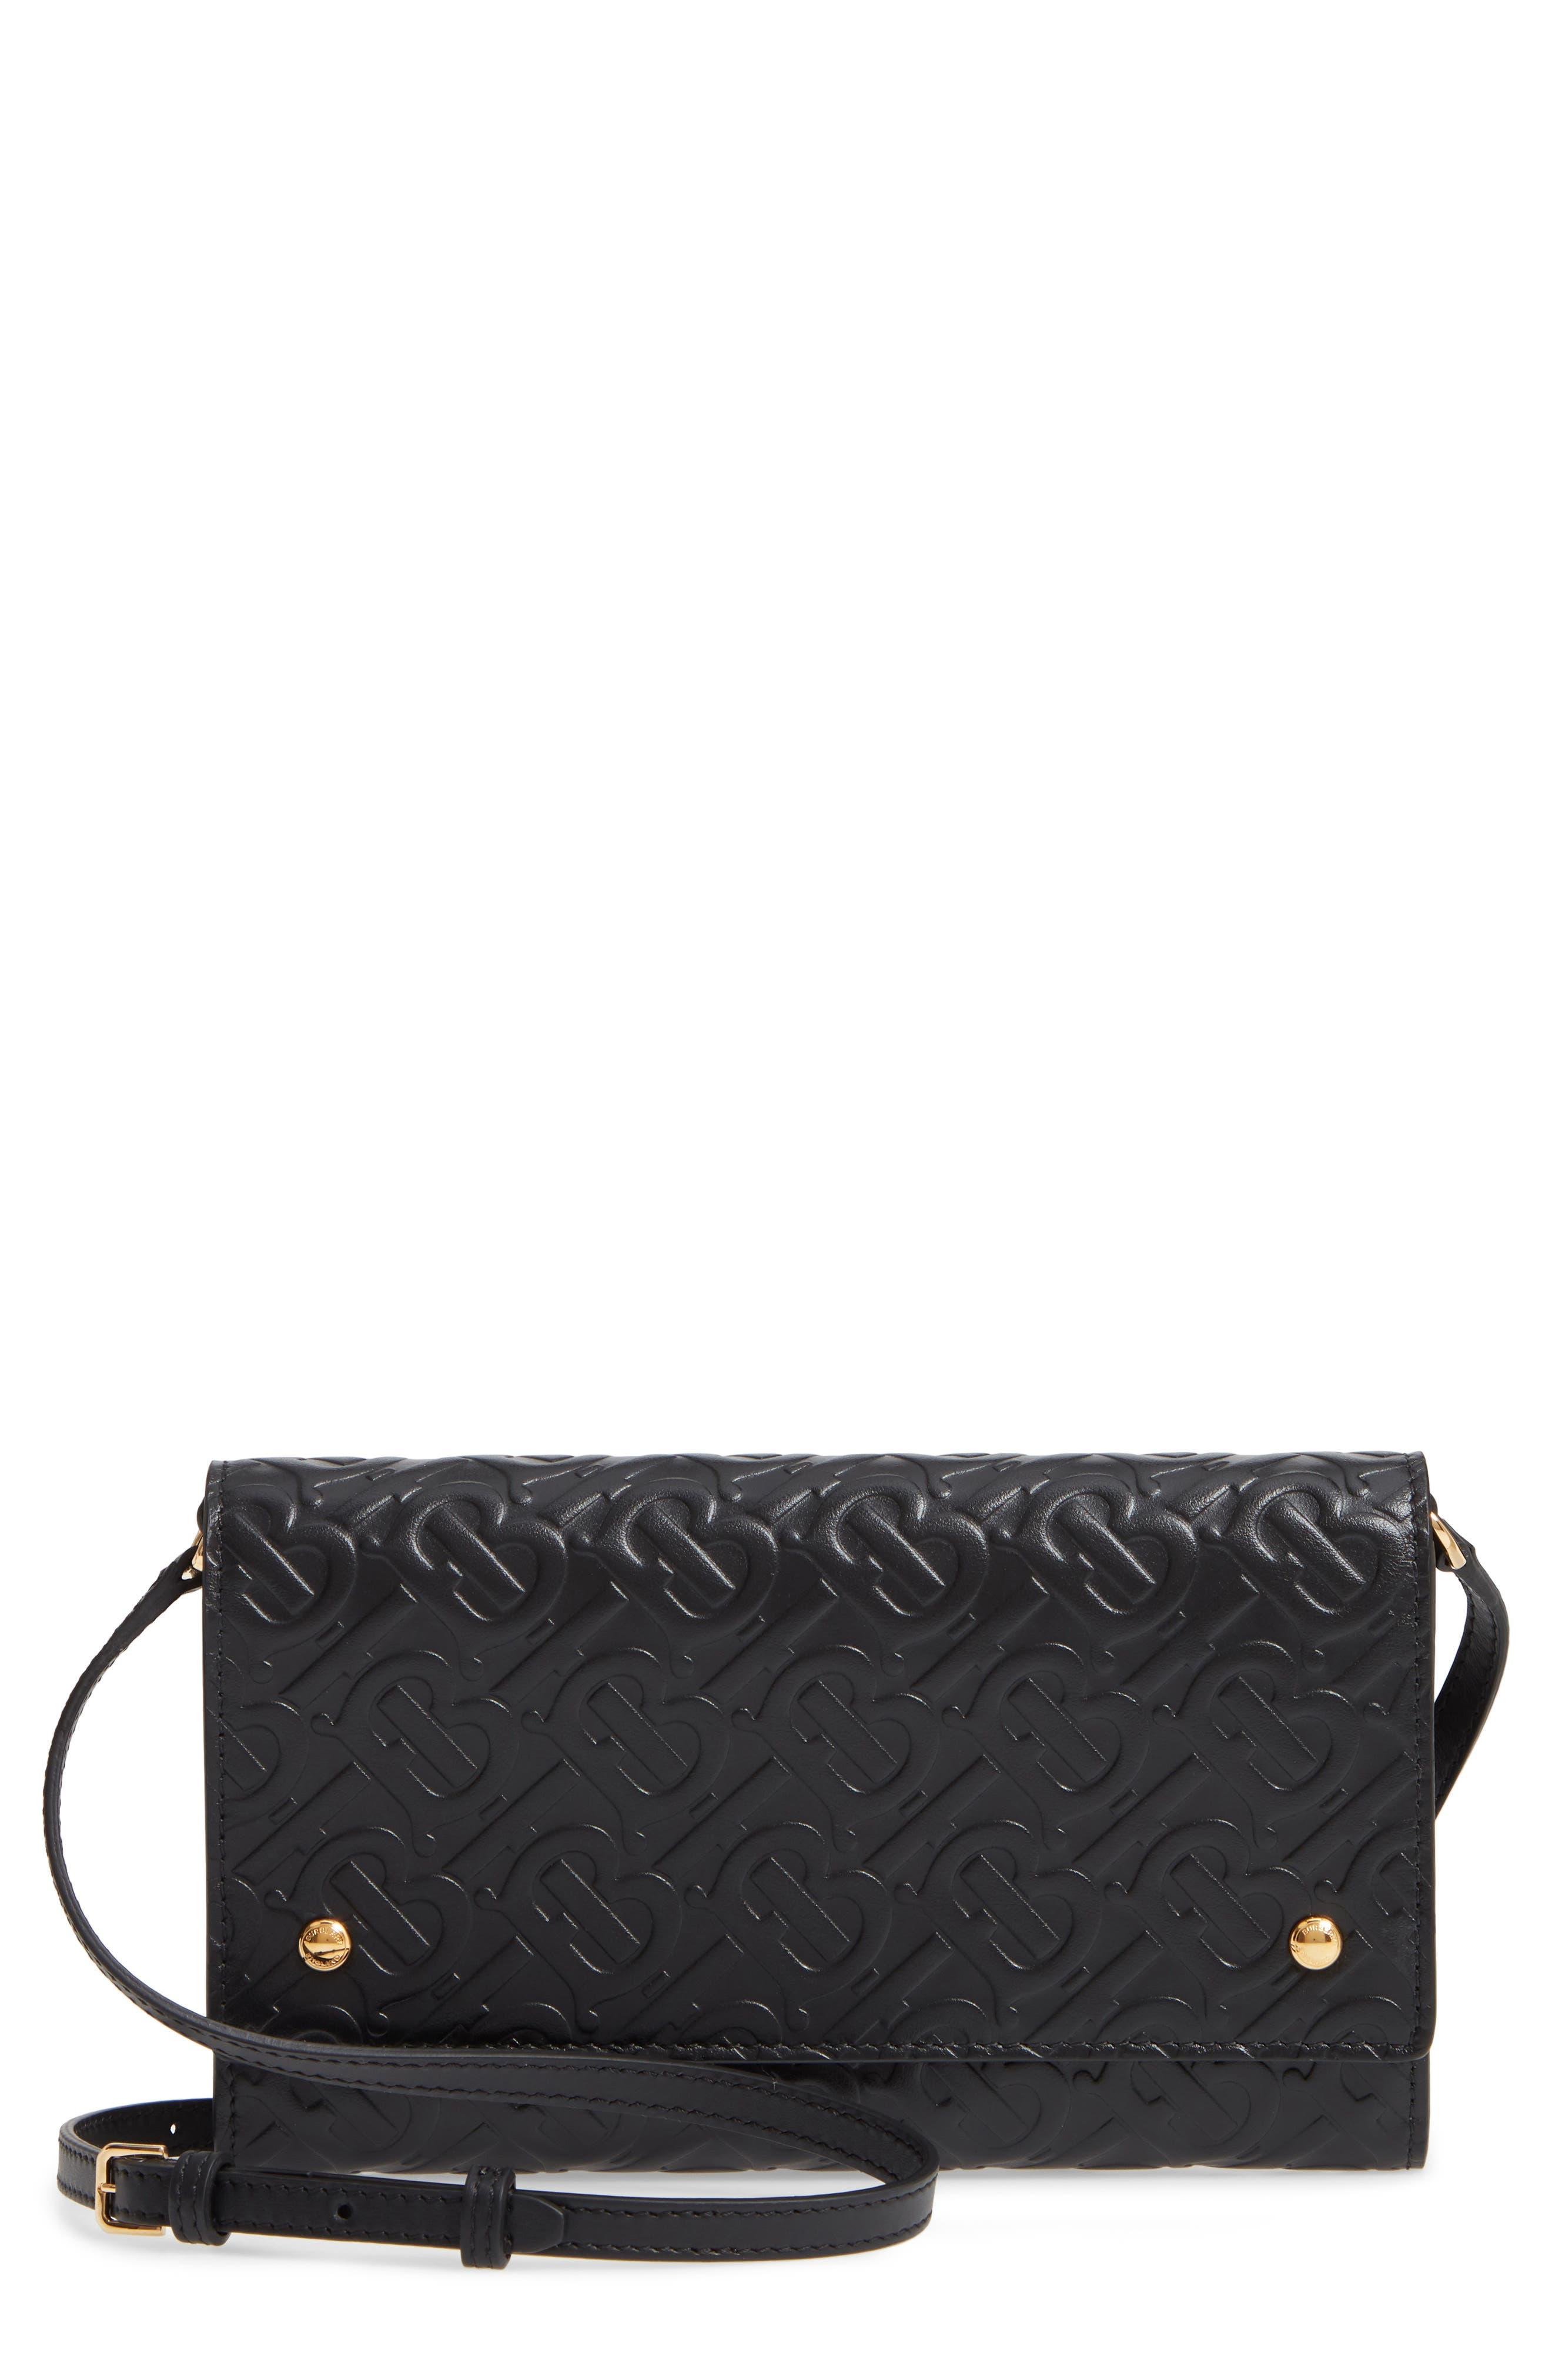 BURBERRY, Monogram Embossed Leather Crossbody Wallet, Main thumbnail 1, color, BLACK